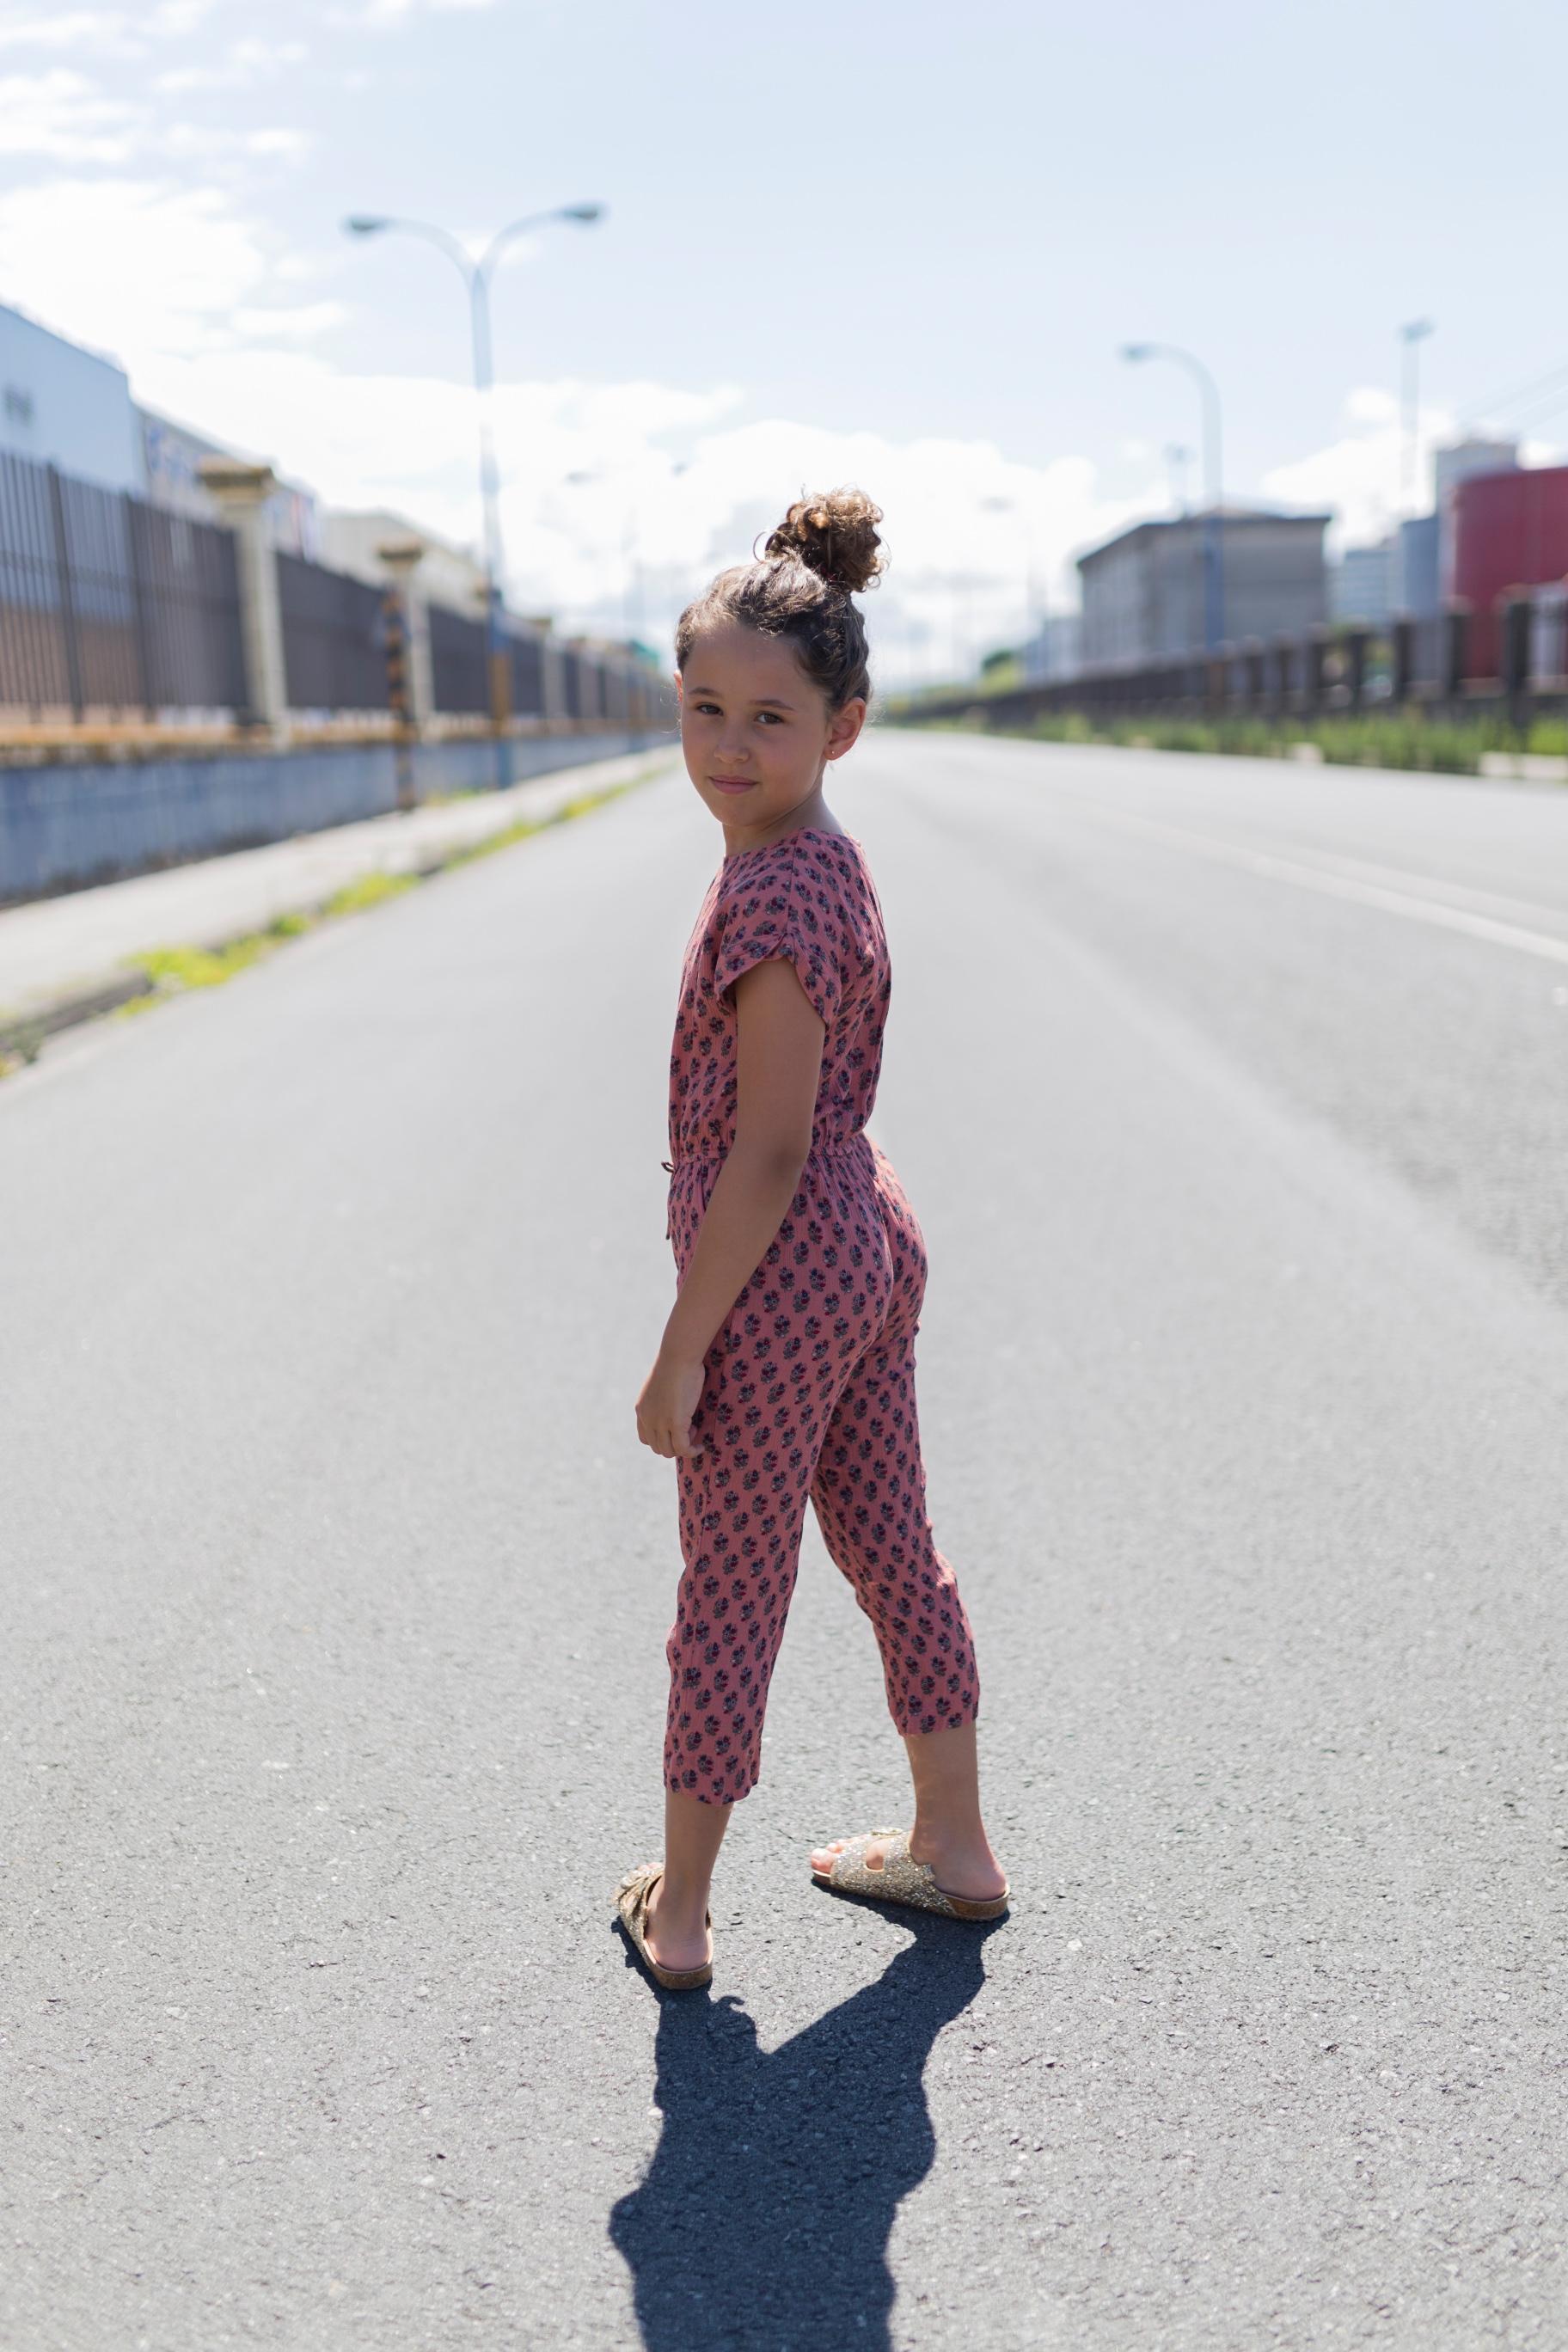 moda-niños-coruña- jimena look- kids- miniblogger- ministyle- Soft- streetstyle- zara- zara kids- zara soft-descalzaporelparque-fashion kids